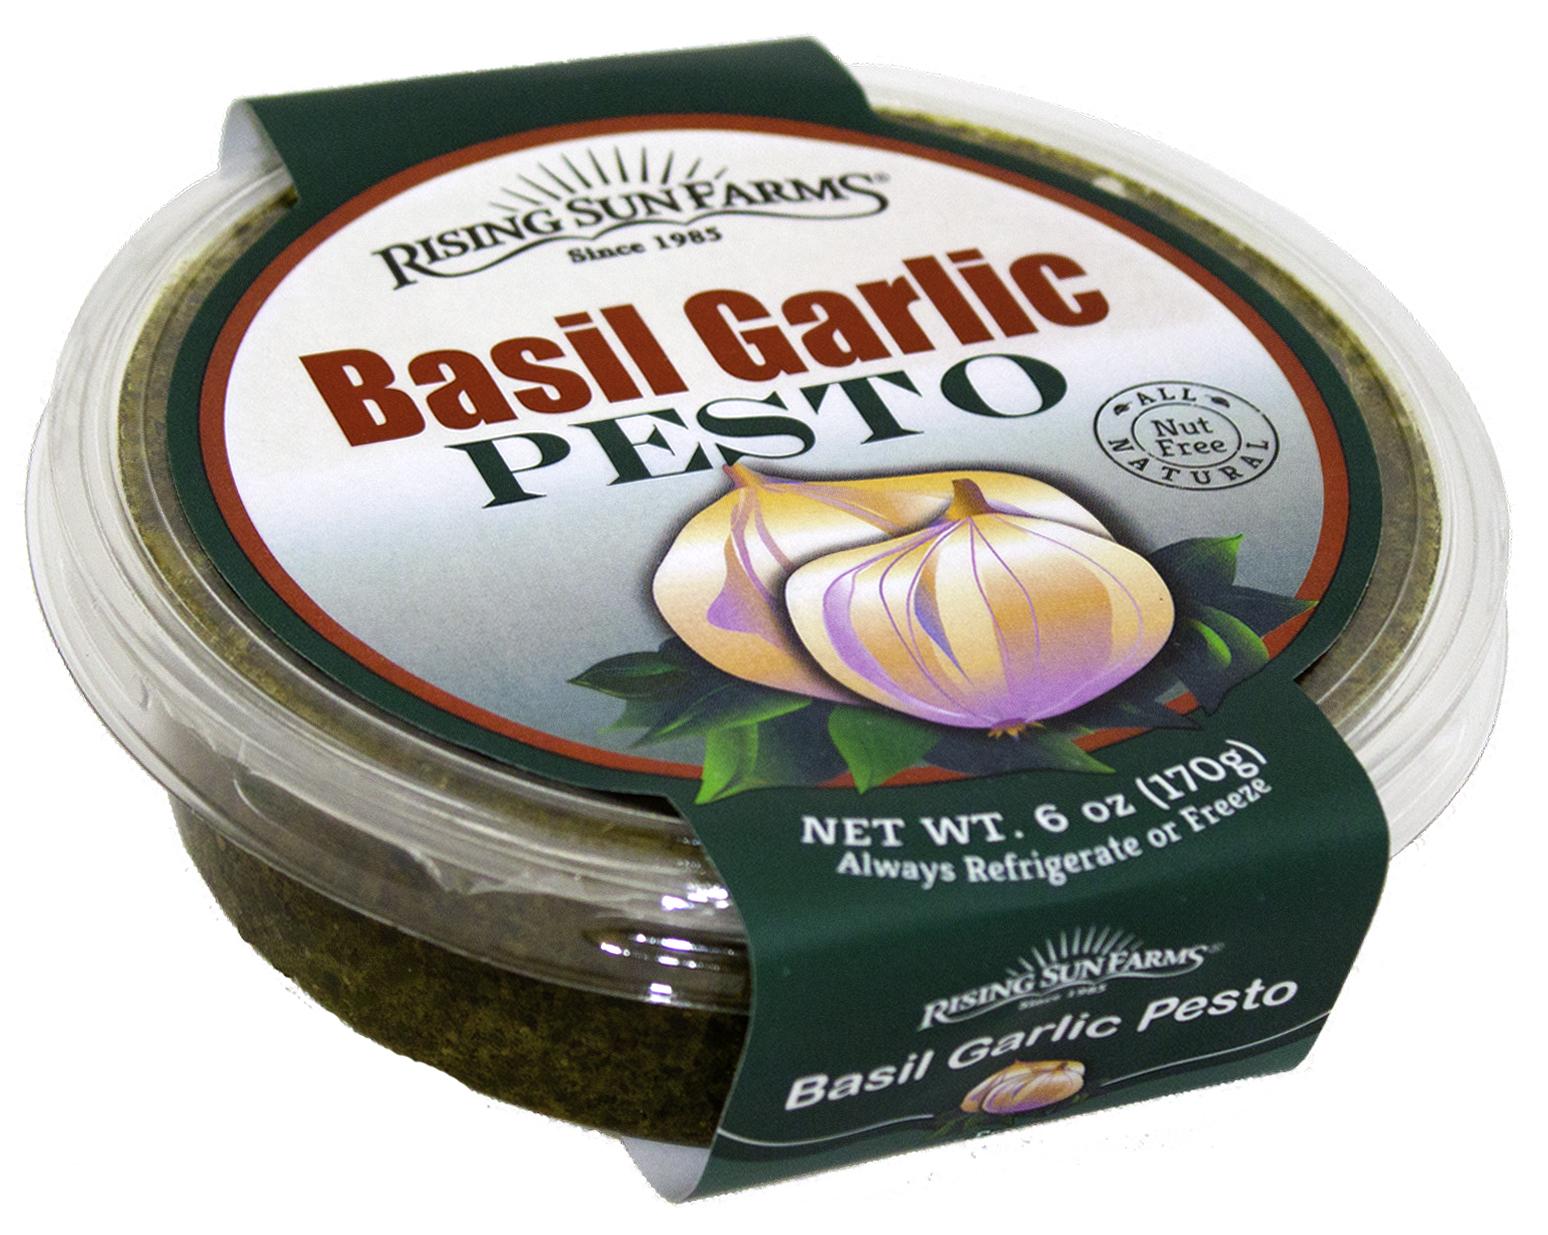 Basil Garlic